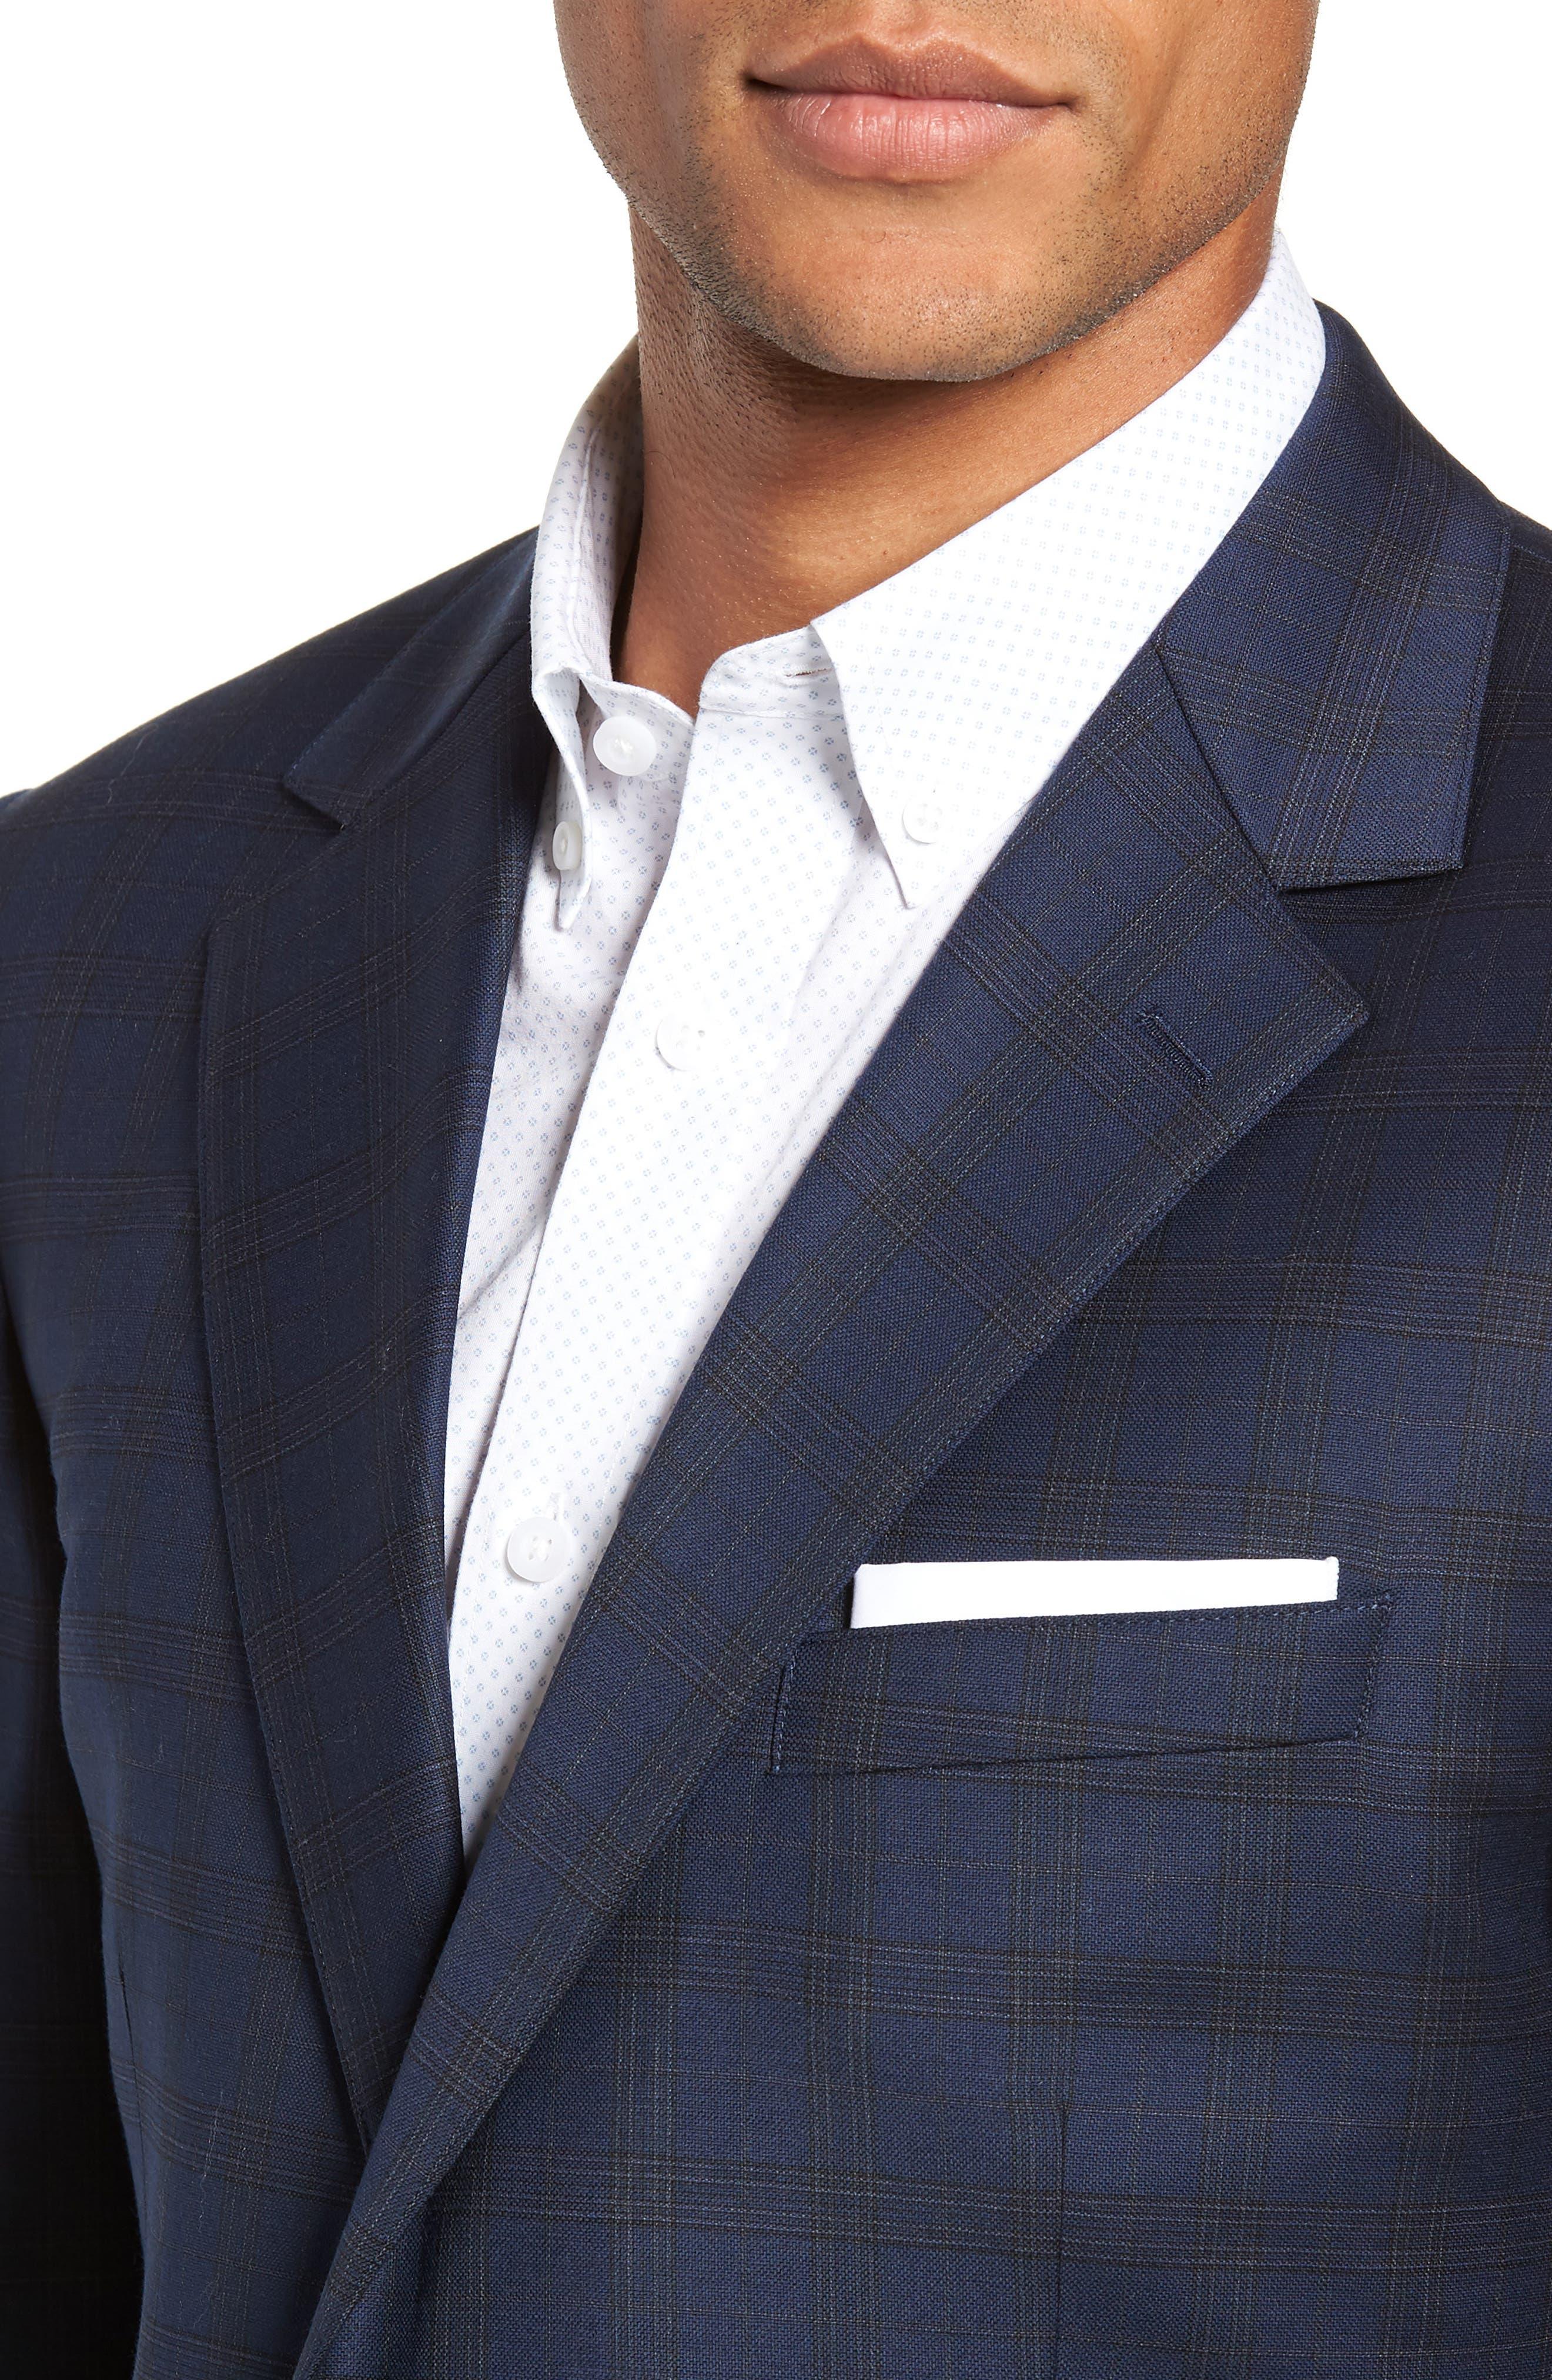 Jetsetter Slim Fit Stretch Wool Sport Coat,                             Alternate thumbnail 3, color,                             SUBTLE NAVY PLAID